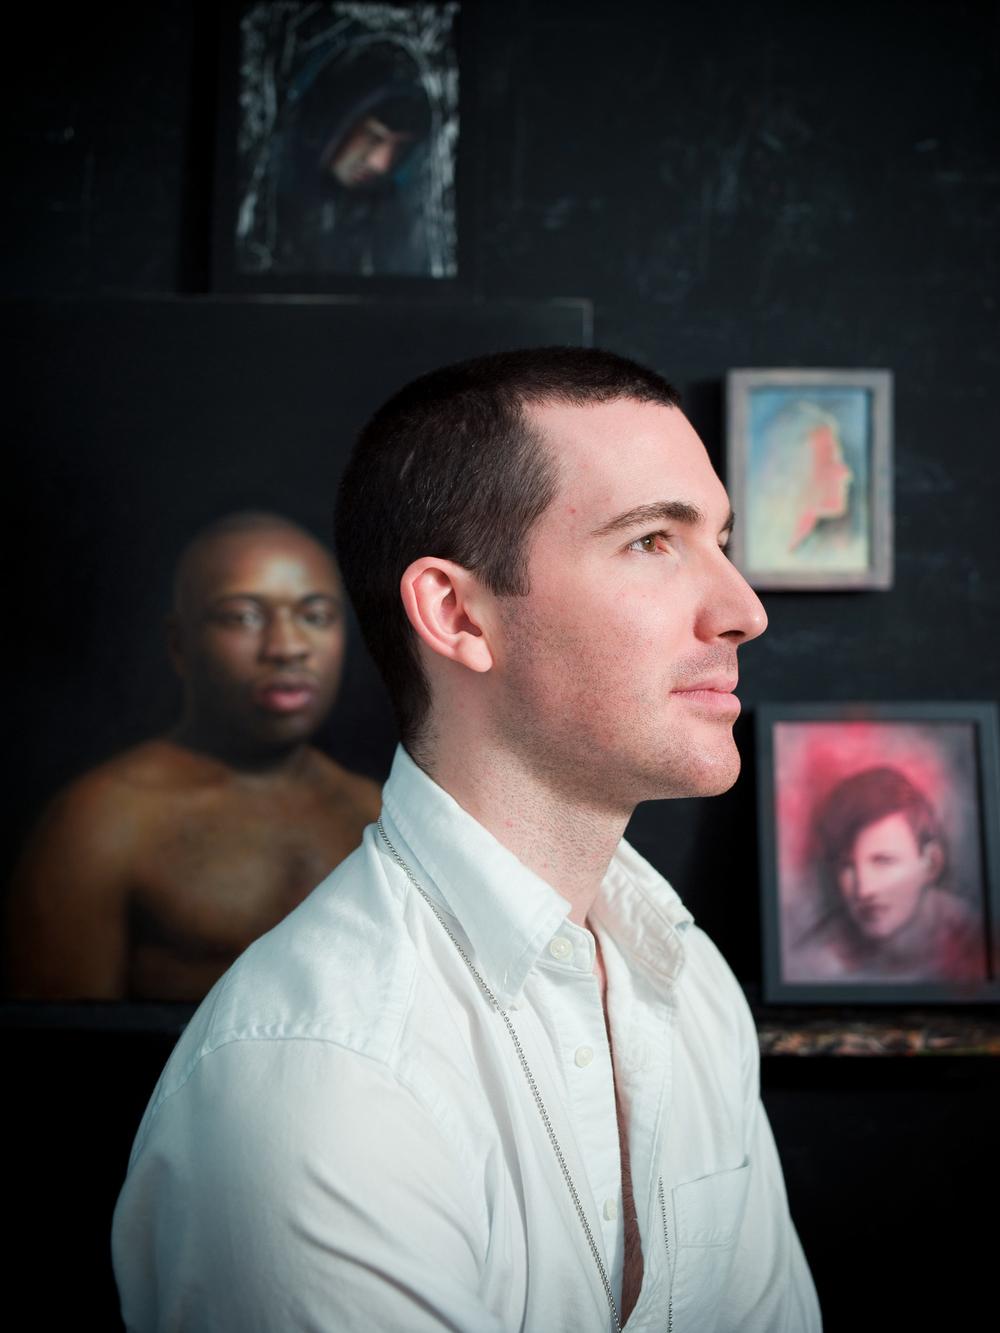 TM Davy, artist